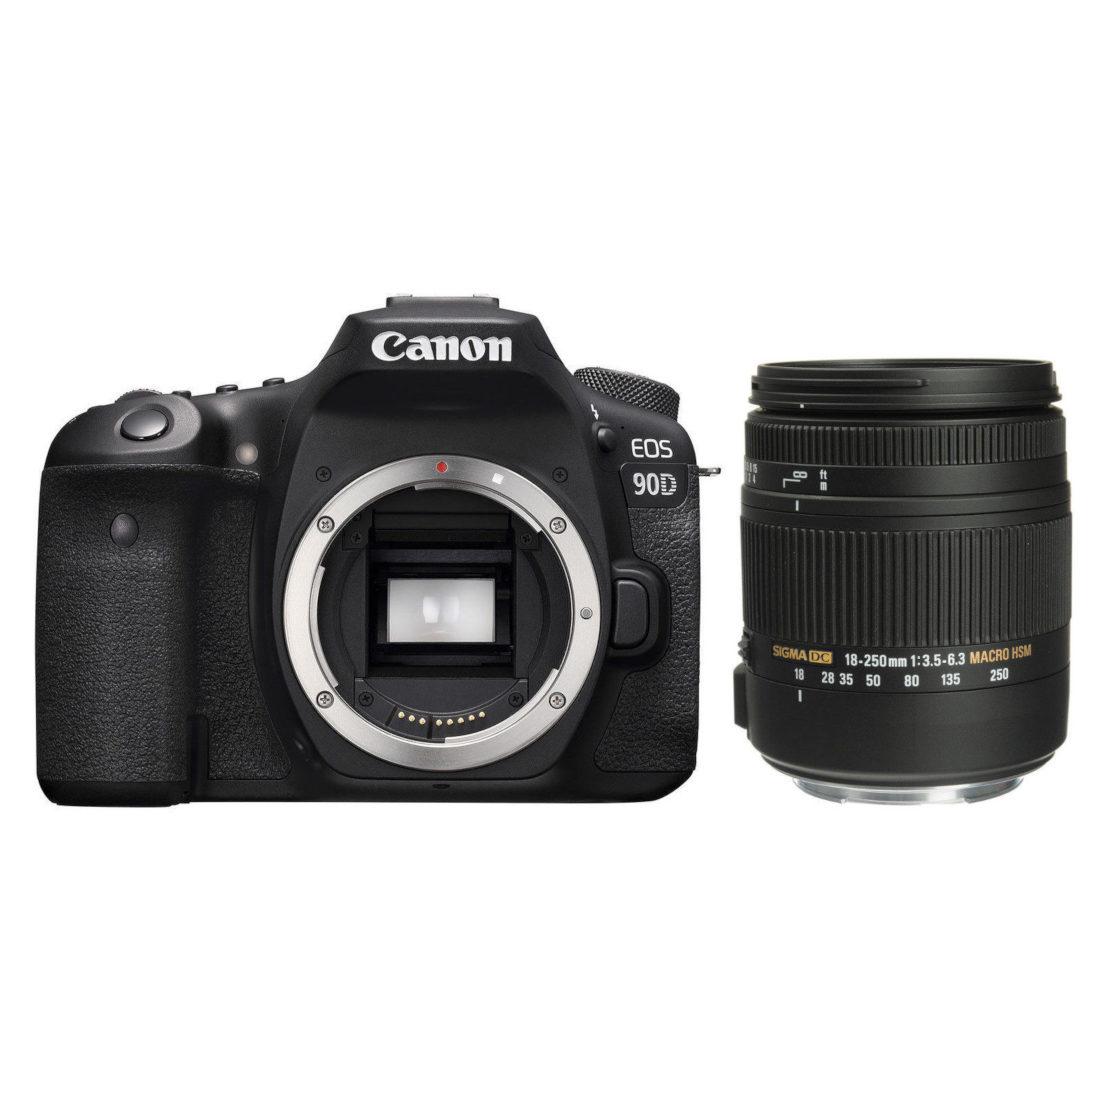 Canon EOS 90D DSLR + Sigma 18-250mm f/3.5-6.3 DC OS HSM Macro <br/>€ 1549.00 <br/> <a href='https://www.cameranu.nl/fotografie/?tt=12190_474631_241358_&r=https%3A%2F%2Fwww.cameranu.nl%2Fnl%2Fp3130182%2Fcanon-eos-90d-dslr-sigma-18-250mm-f-3-5-6-3-dc-os-hsm-macro%3Fchannable%3De10841.MzEzMDE4Mg%26utm_campaign%3D%26utm_content%3DEOS%2Bspiegelreflex%26utm_source%3DTradetracker%26utm_medium%3Dcpc%26utm_term%3DDigitale%2Bcamera%26apos%3Bs' target='_blank'>naar de winkel</a>